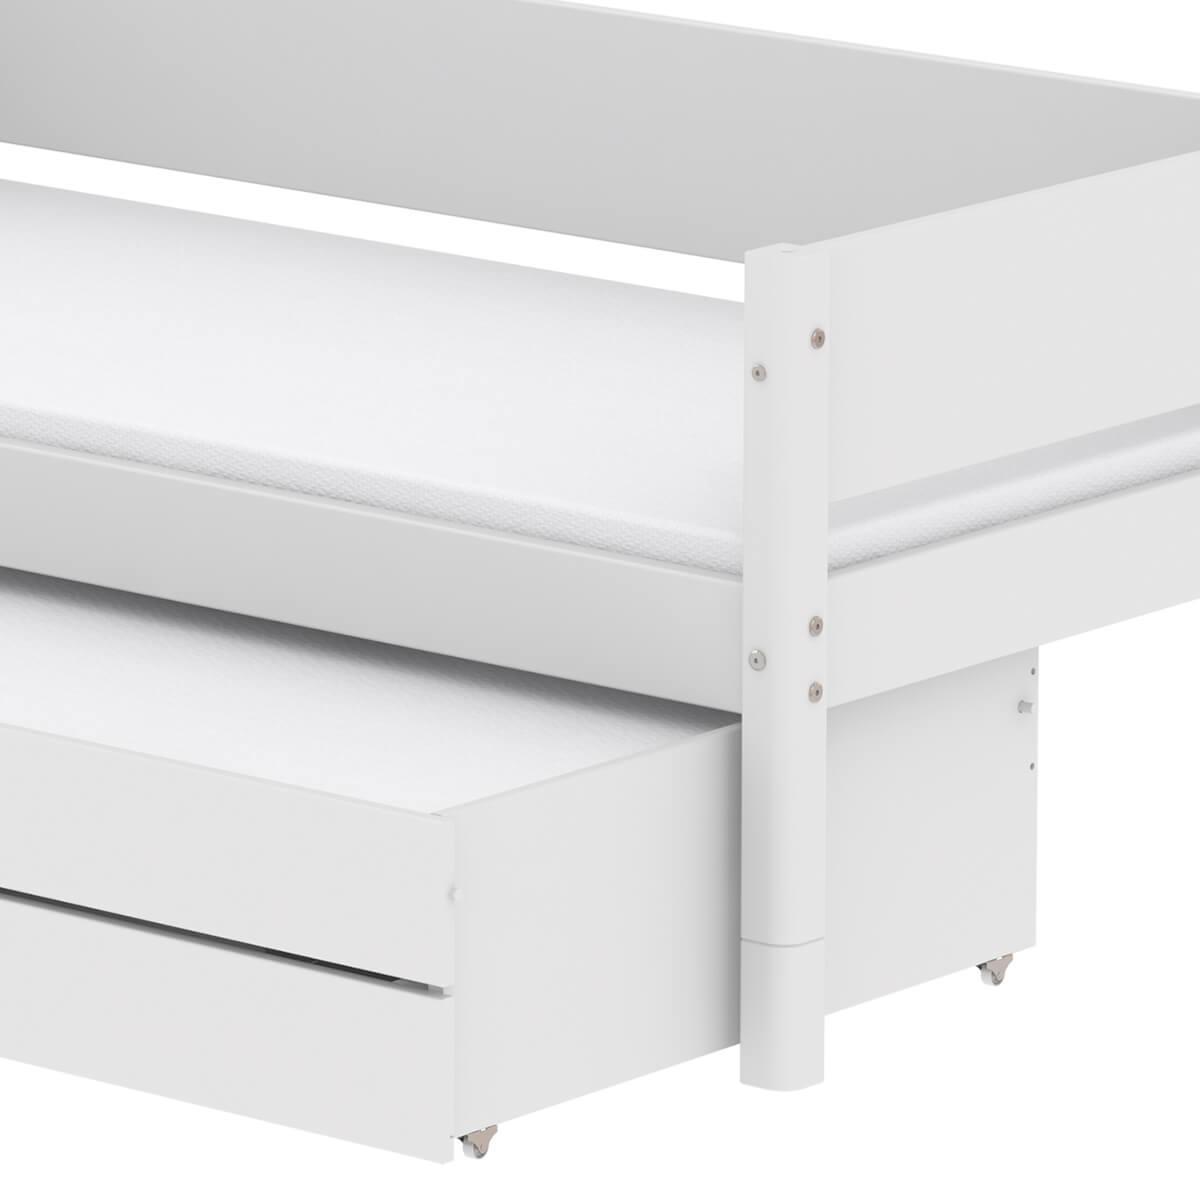 Lit enfant 90x190cm lit gigogne-2 tiroirs WHITE Flexa blanc